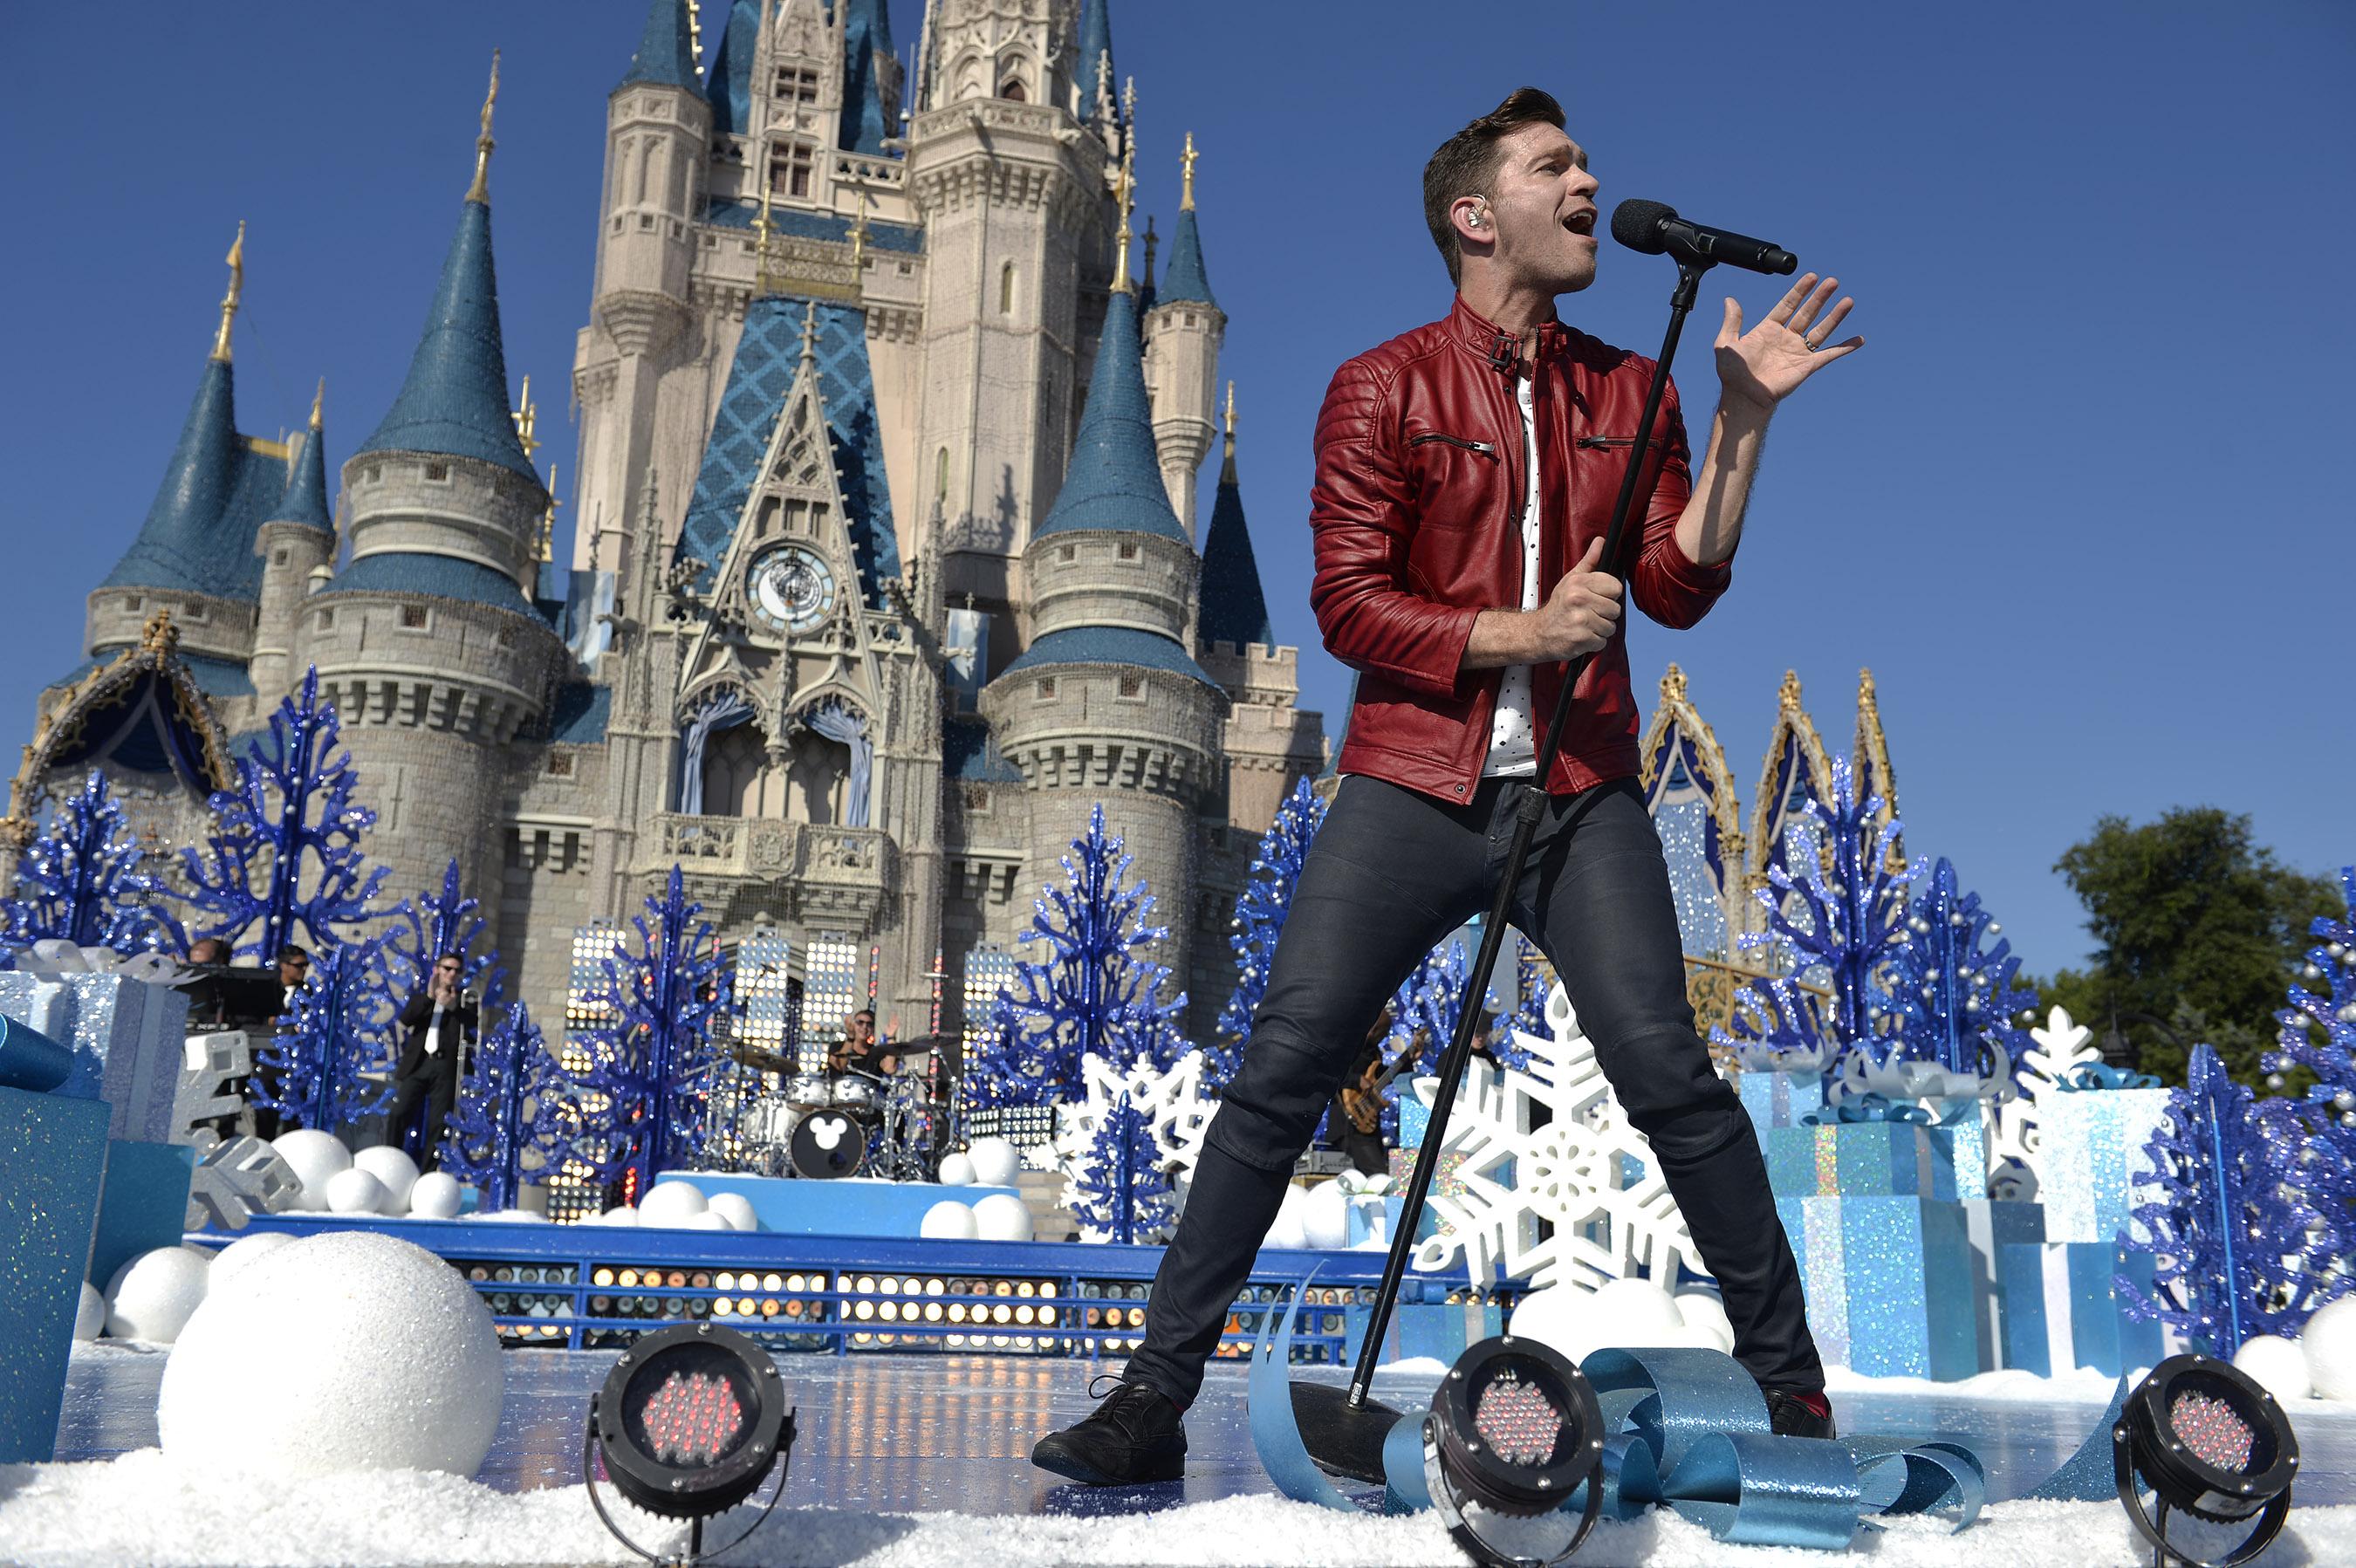 Disney Parks Unforgettable Christmas Celebration performance - Andy Grammer